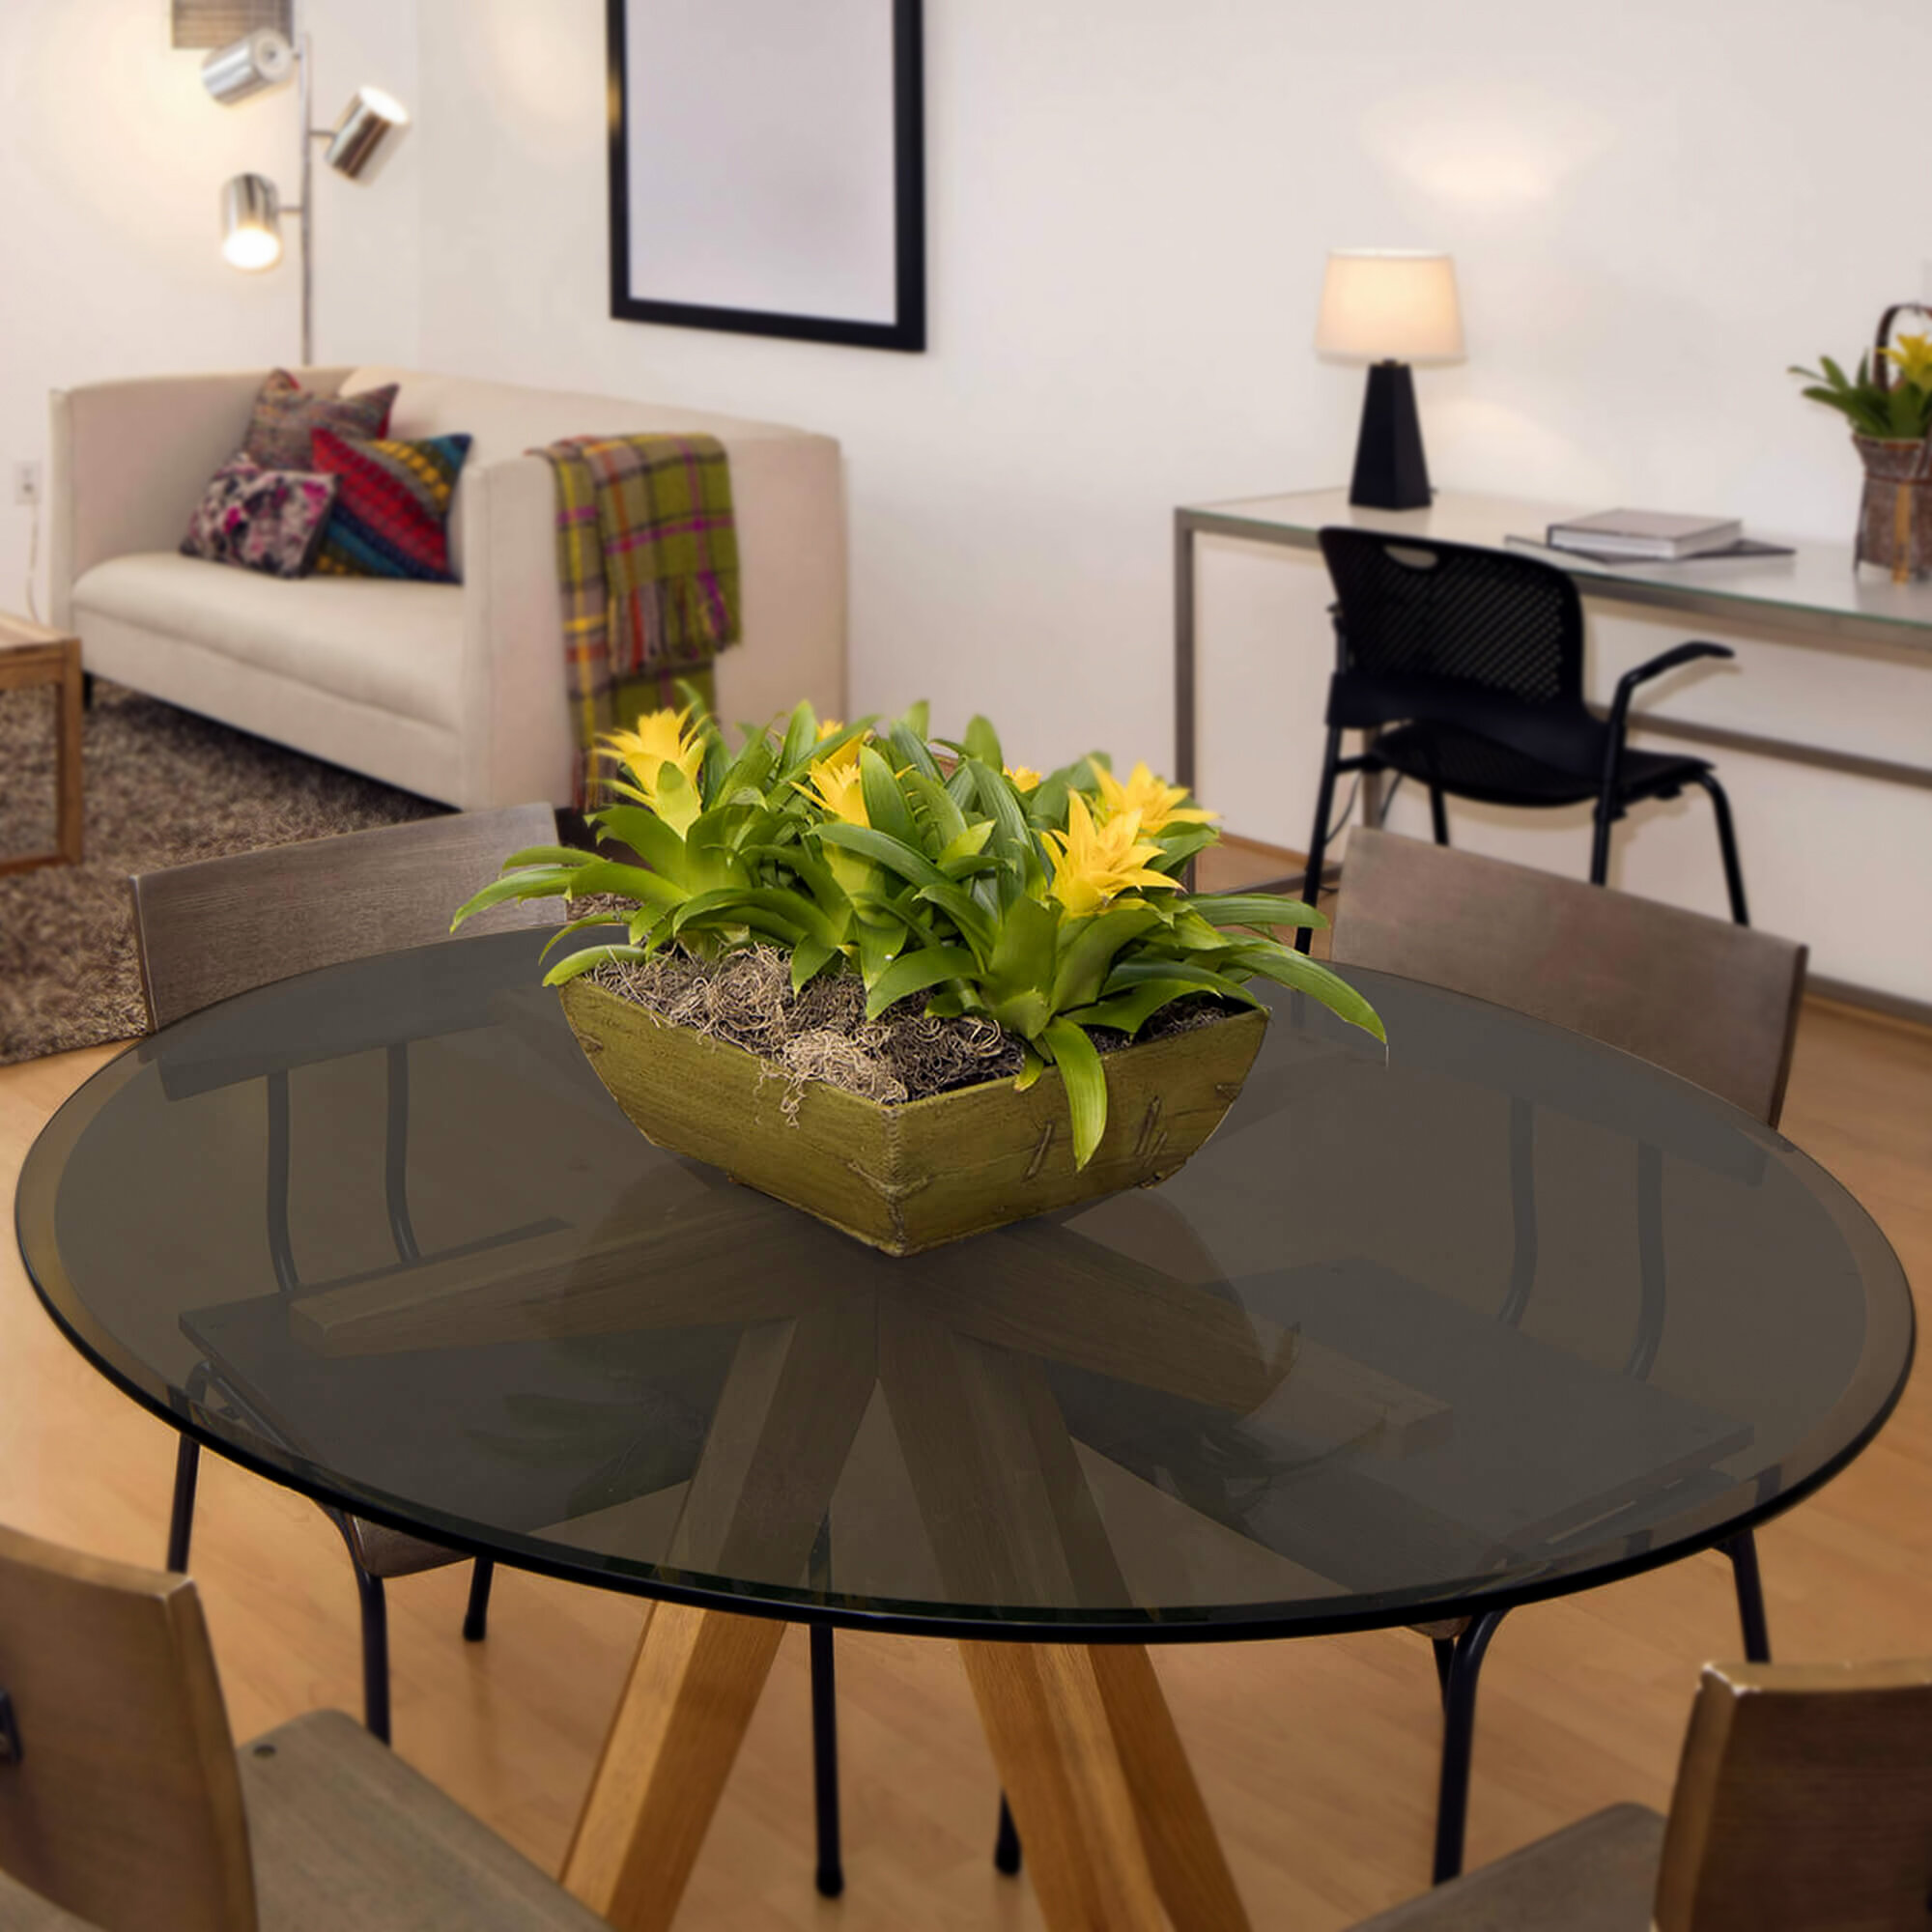 Ebern Designs Round Beveled Tempered Glass Table Top Wayfair